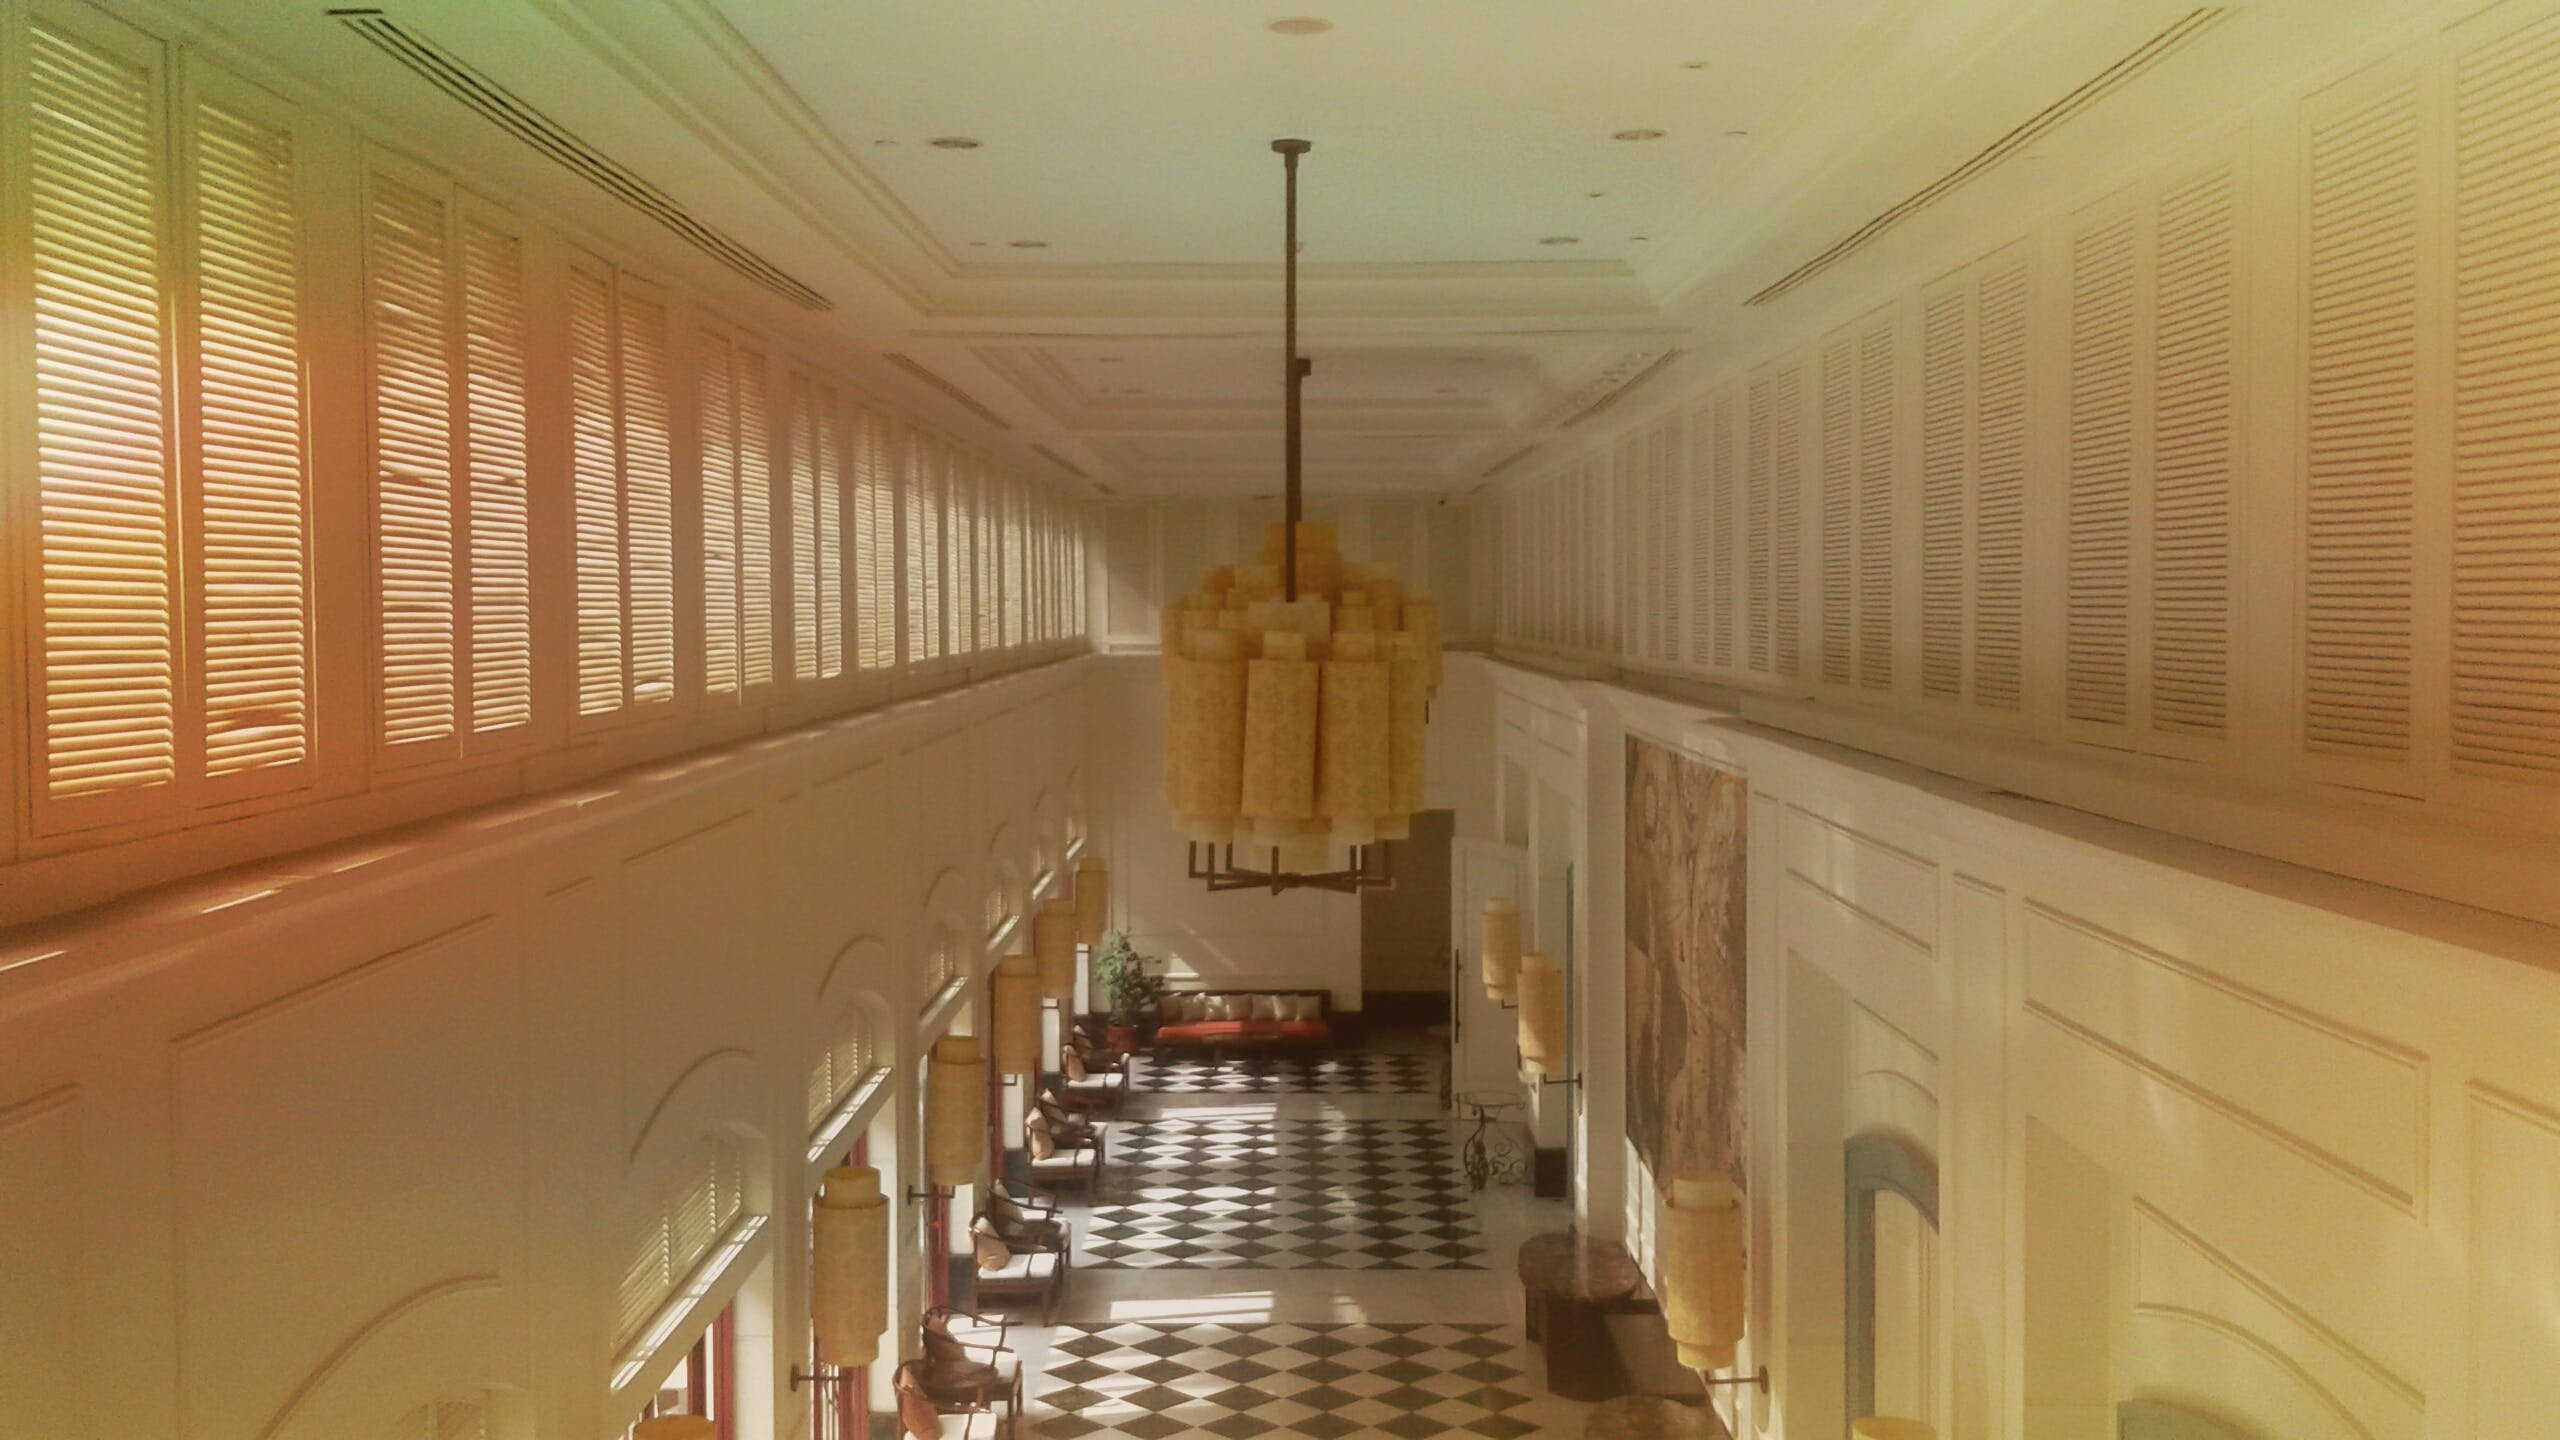 Free stock photo of Celinglight, hall, hallway, lamp